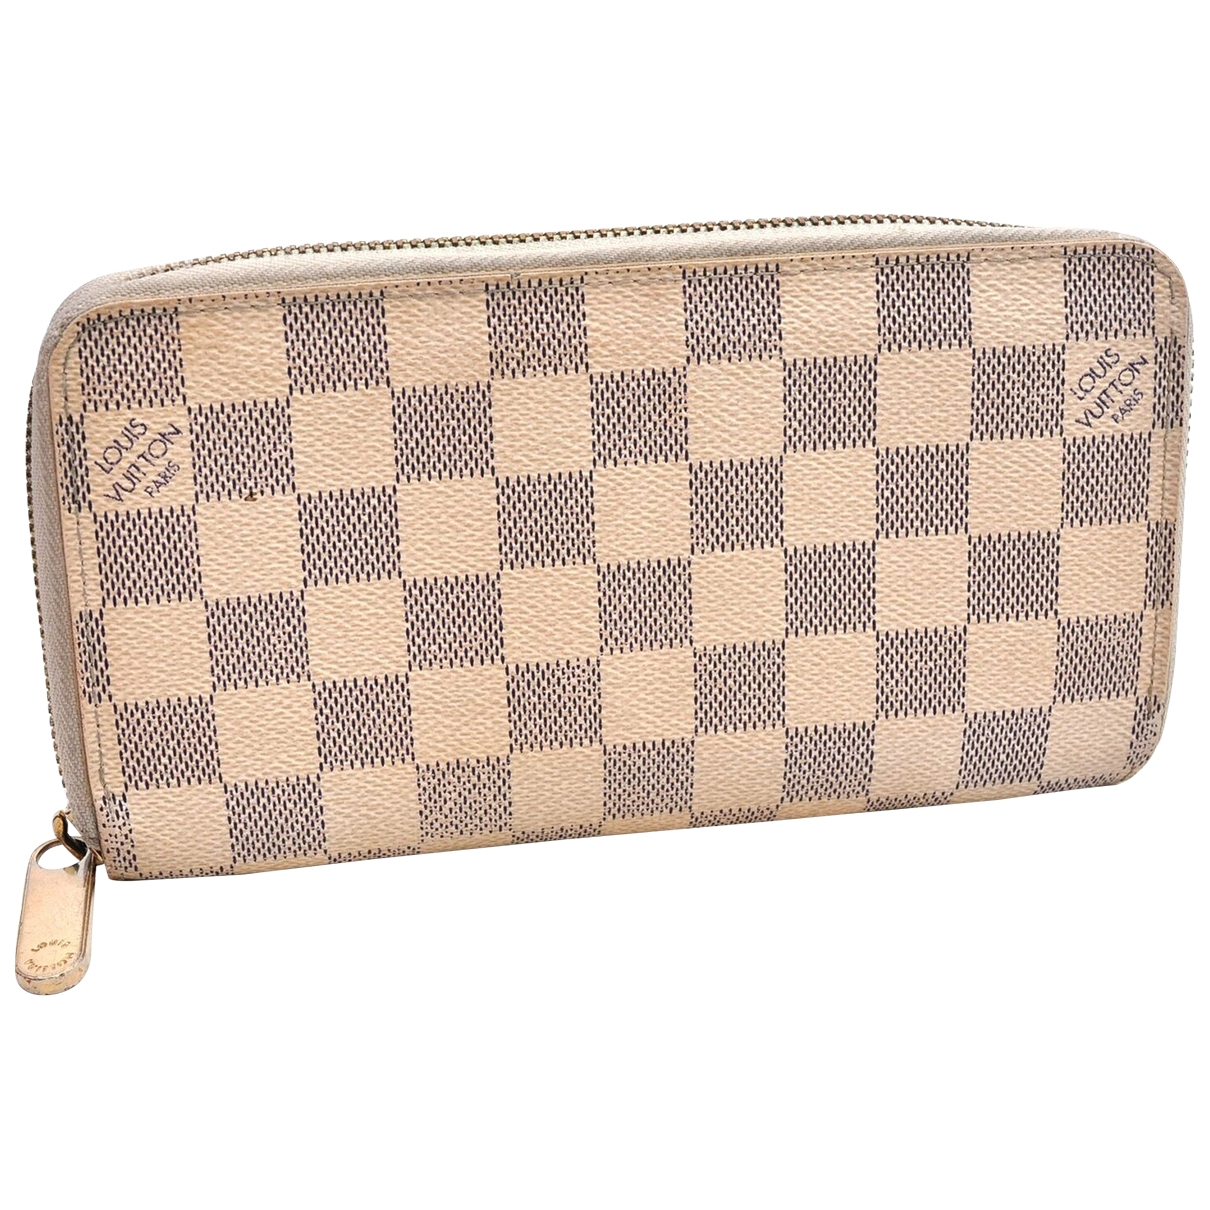 Louis Vuitton \N White Cloth wallet for Women \N